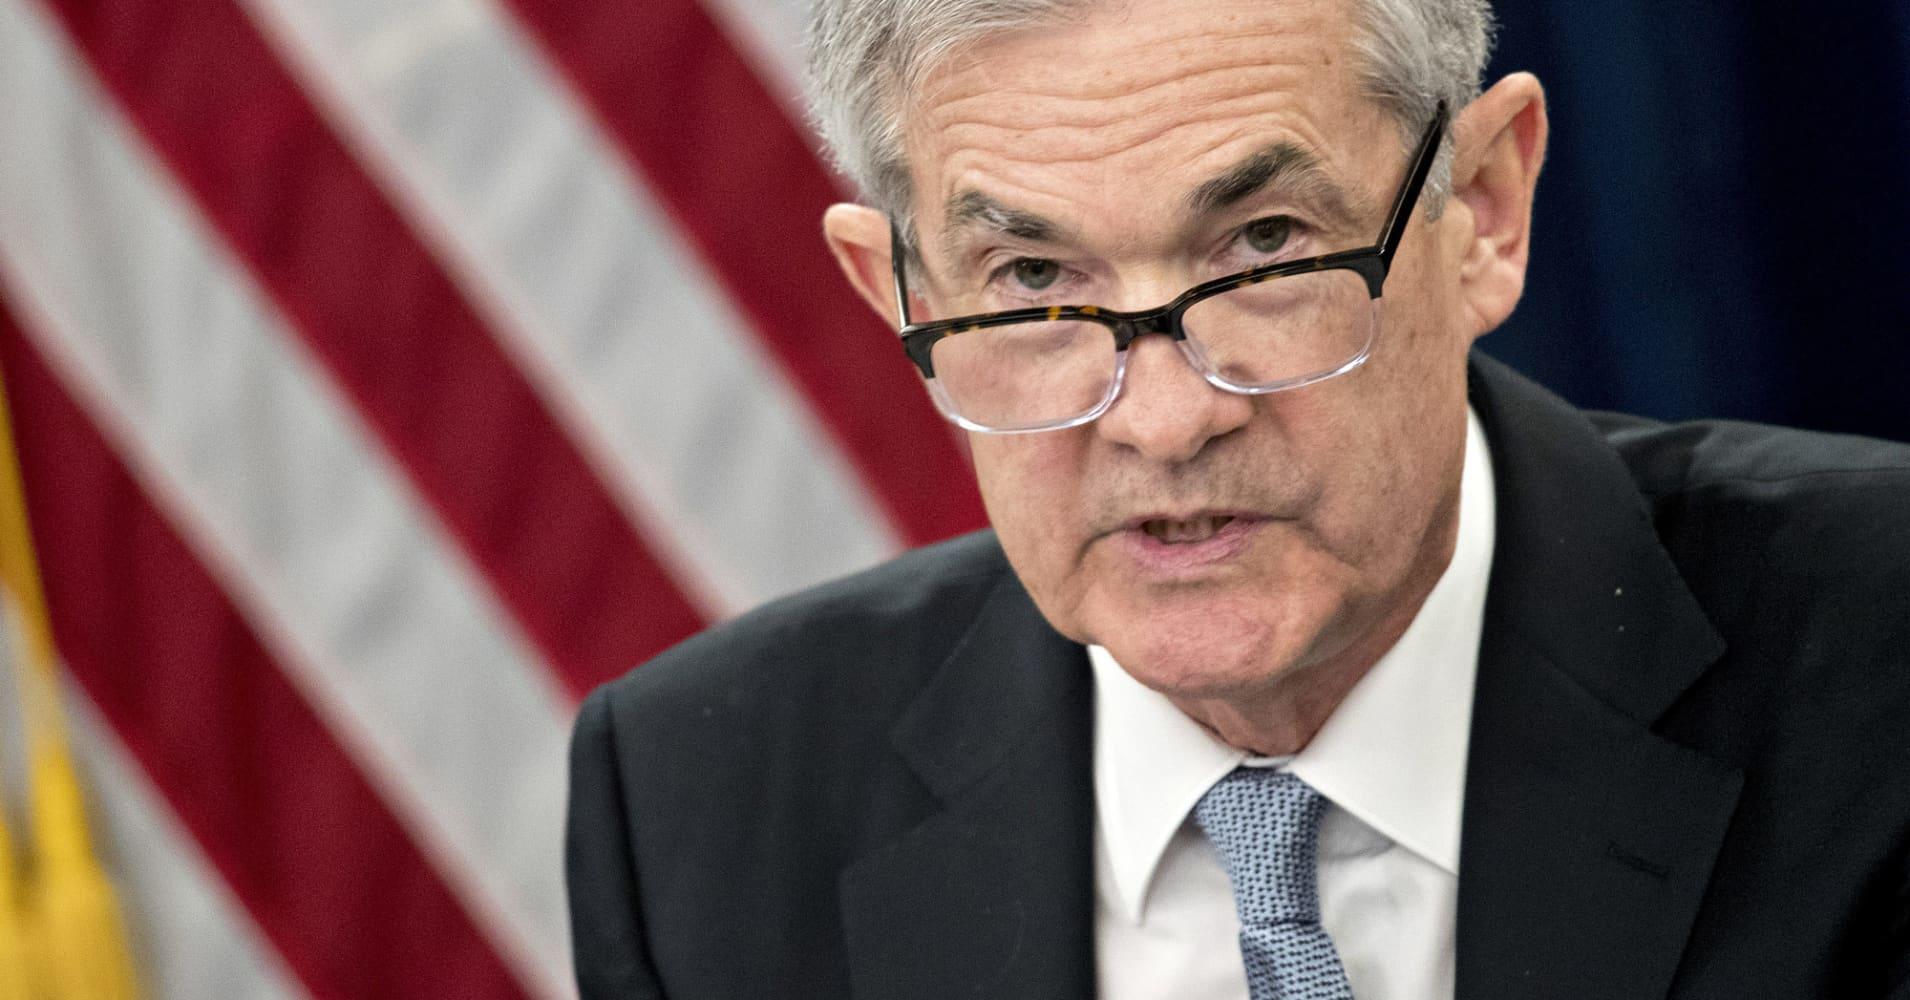 Raises GDP forecast